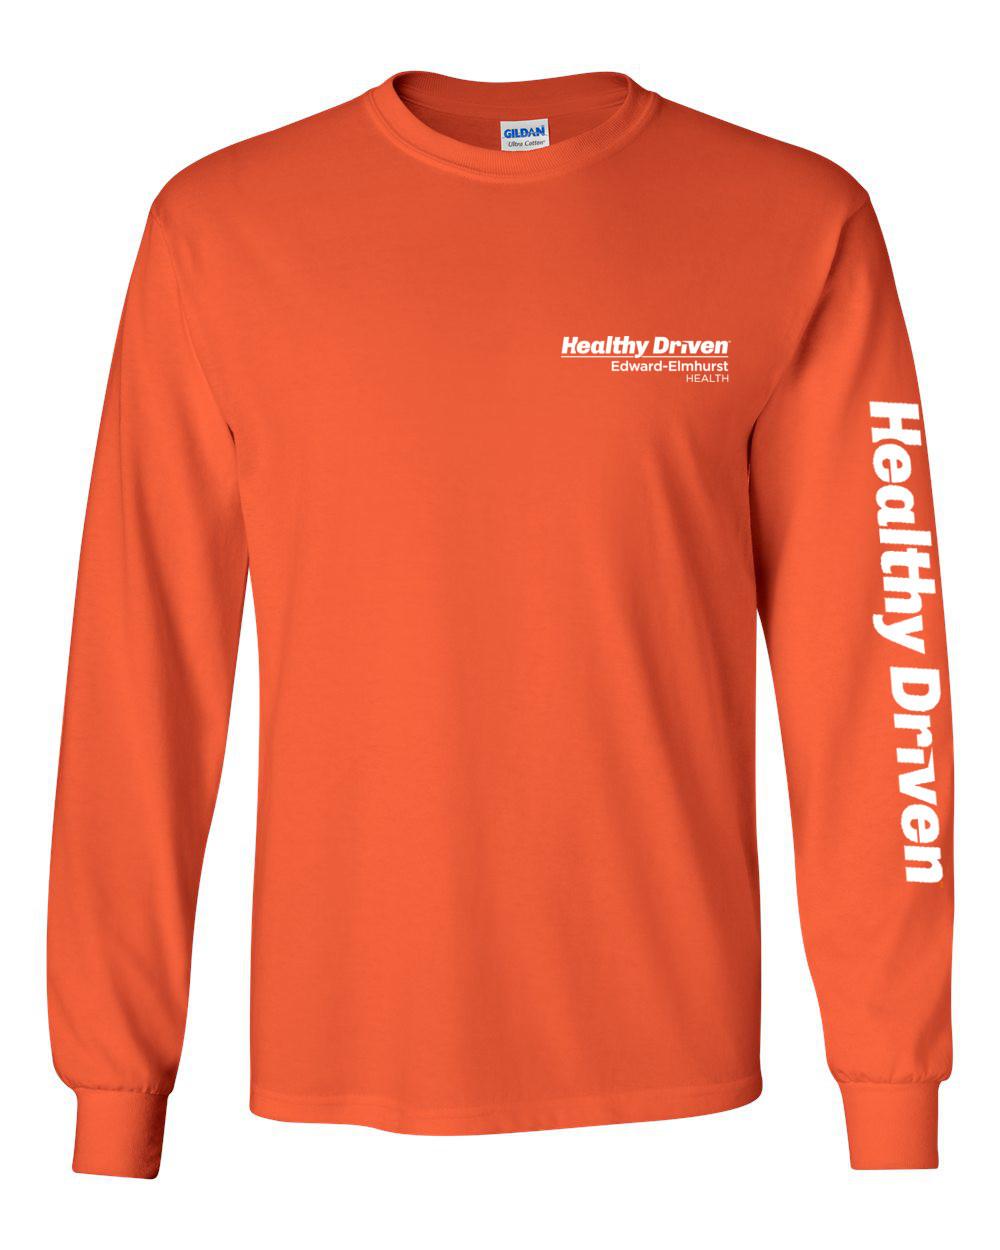 6374e94c Gildan - Ultra Cotton Long Sleeve T-Shirt - Healthy Driven Store